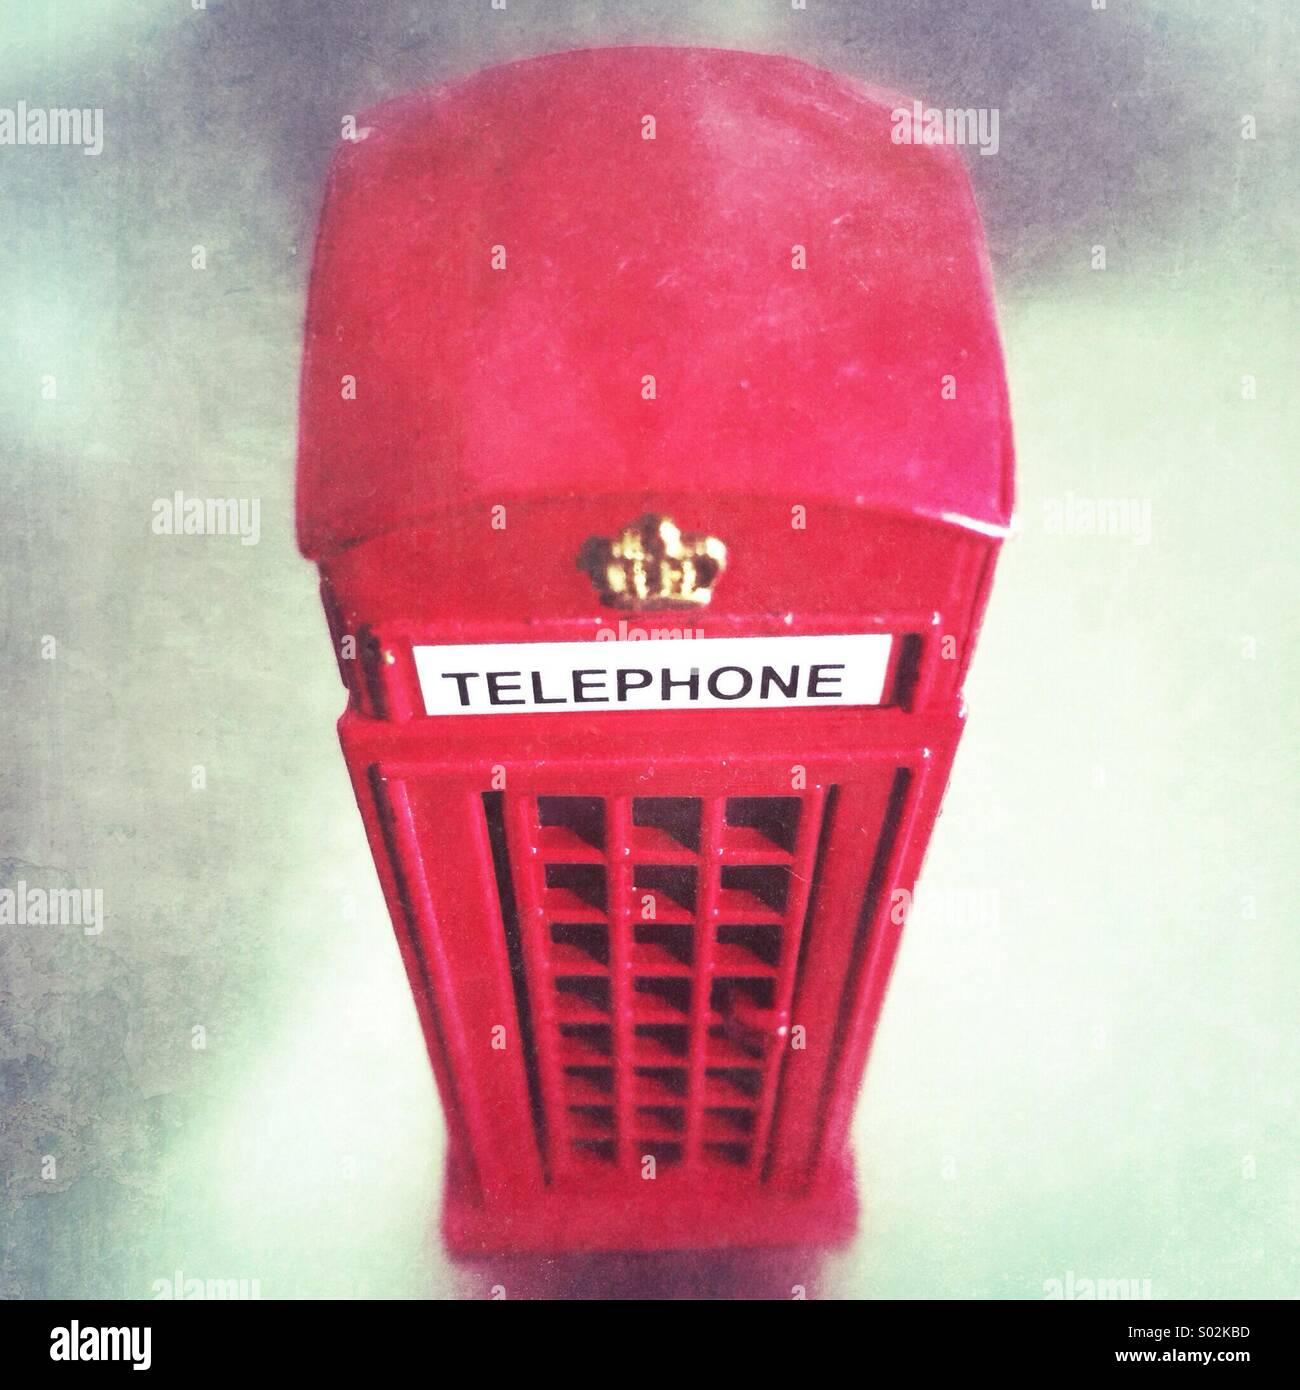 Toy telephone kiosk - Stock Image